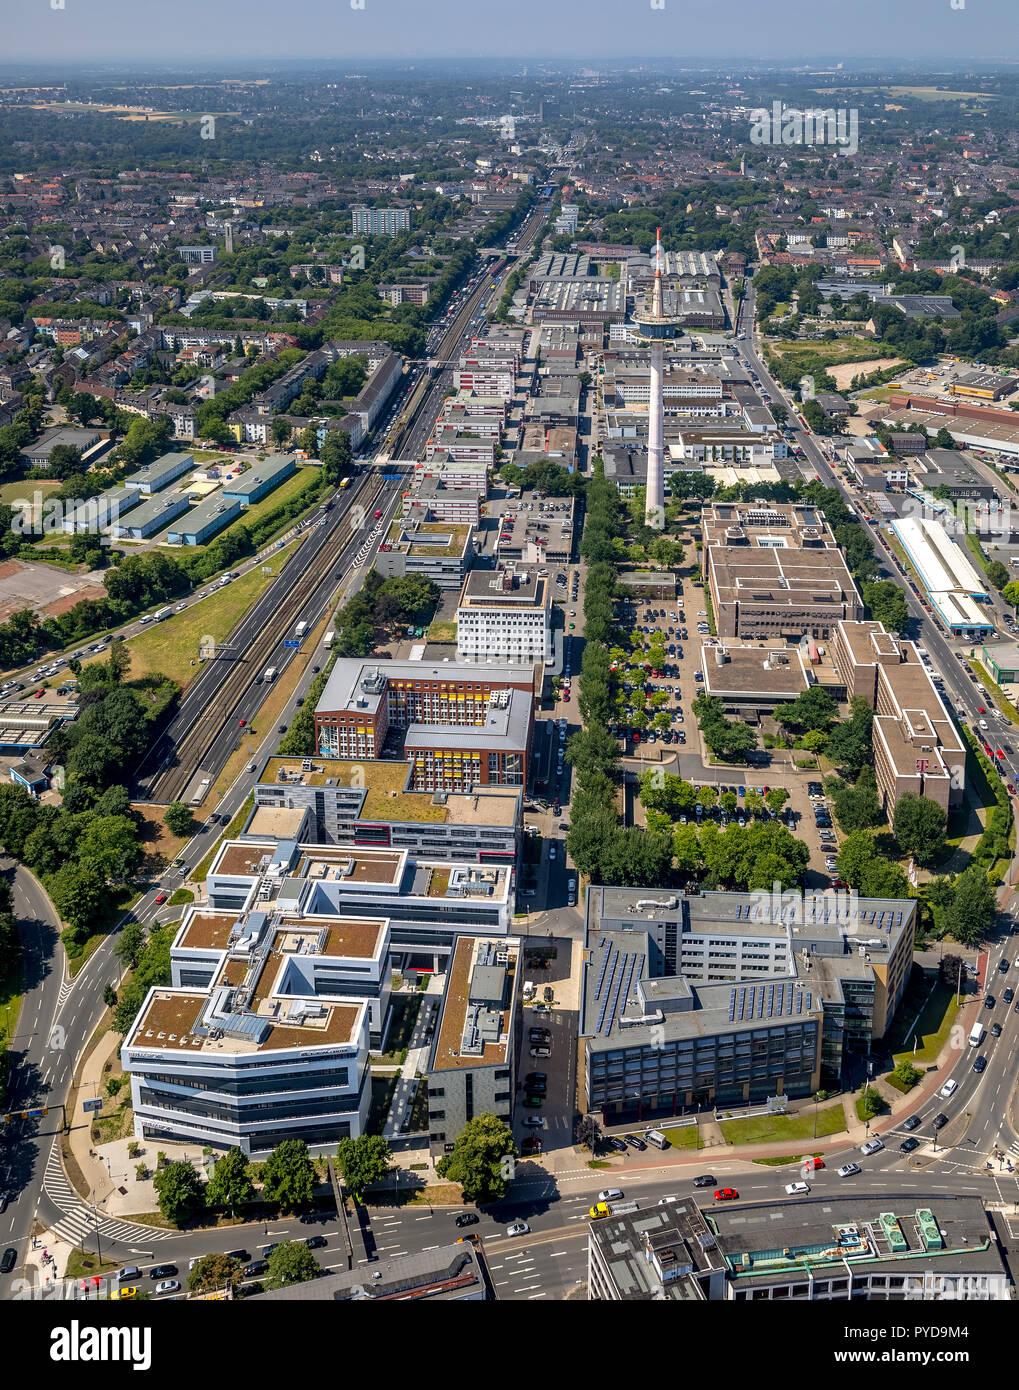 Aerial view, Europa Center Essen, office building, WAZ editorial offices near ETEC Essen, Ruhr Area, North Rhine-Westphalia, Germany, DEU, Europe, bir - Stock Image